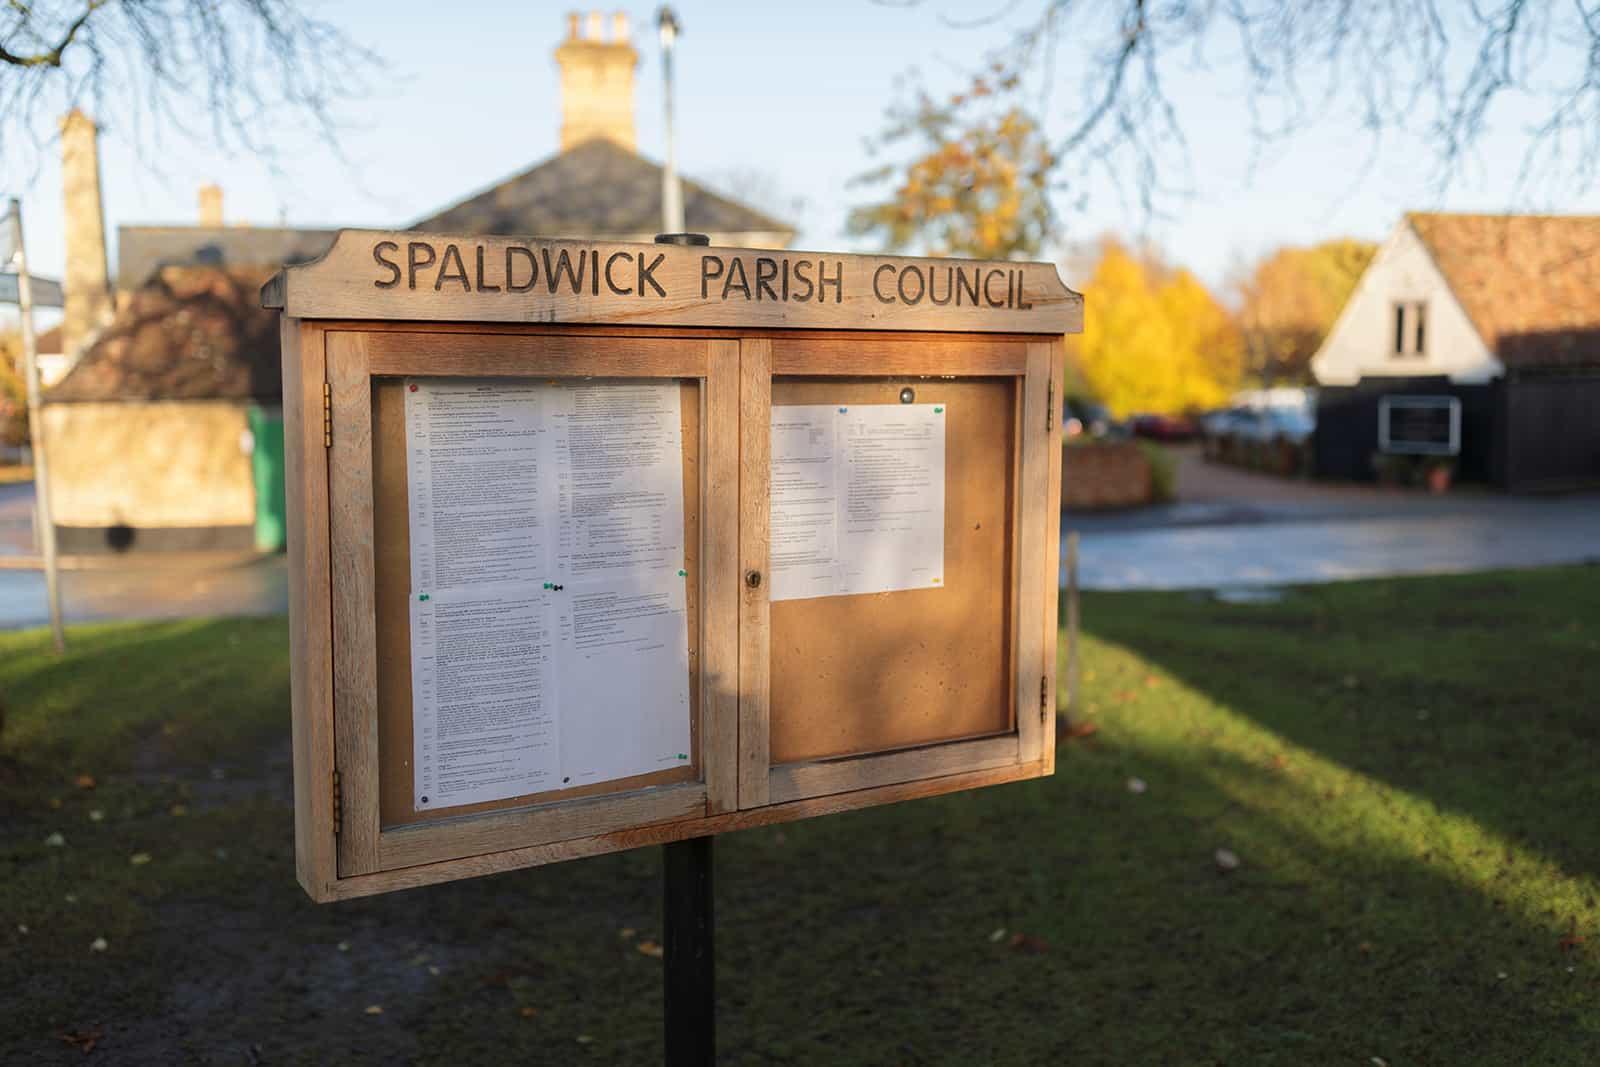 Spaldwick Parish Council